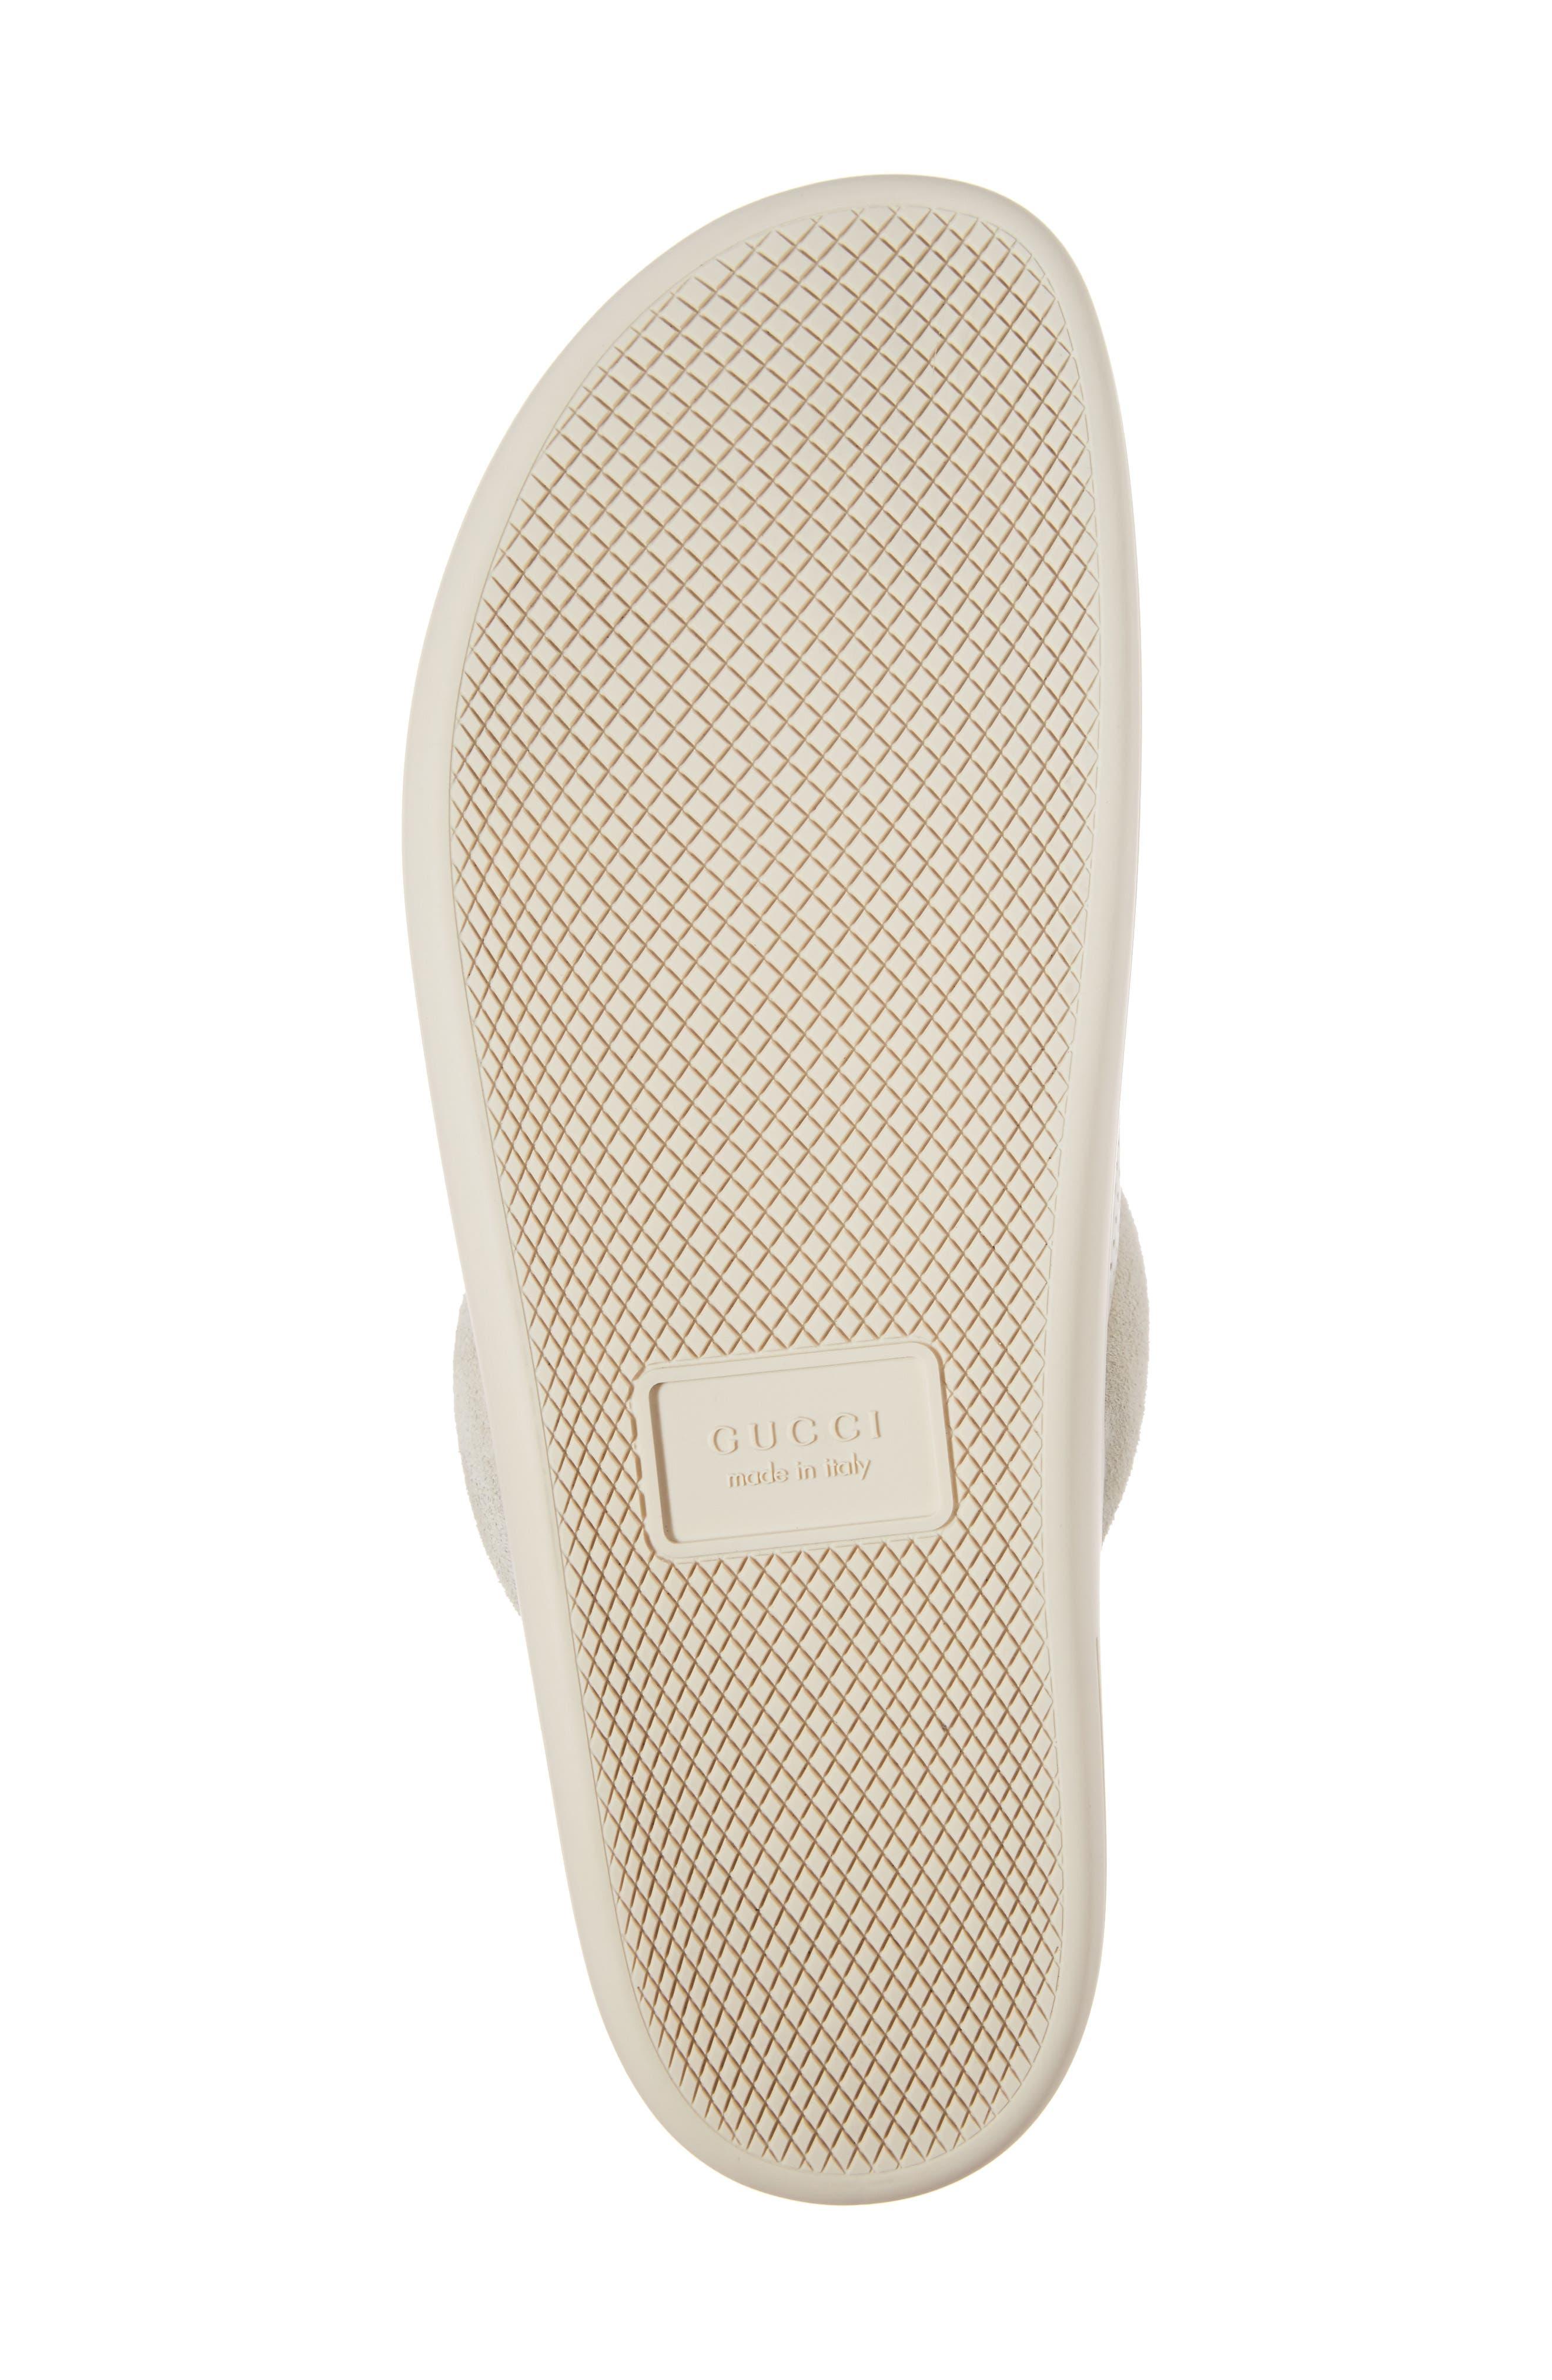 Horsebit Perforated Leather Slipper,                             Alternate thumbnail 6, color,                             157